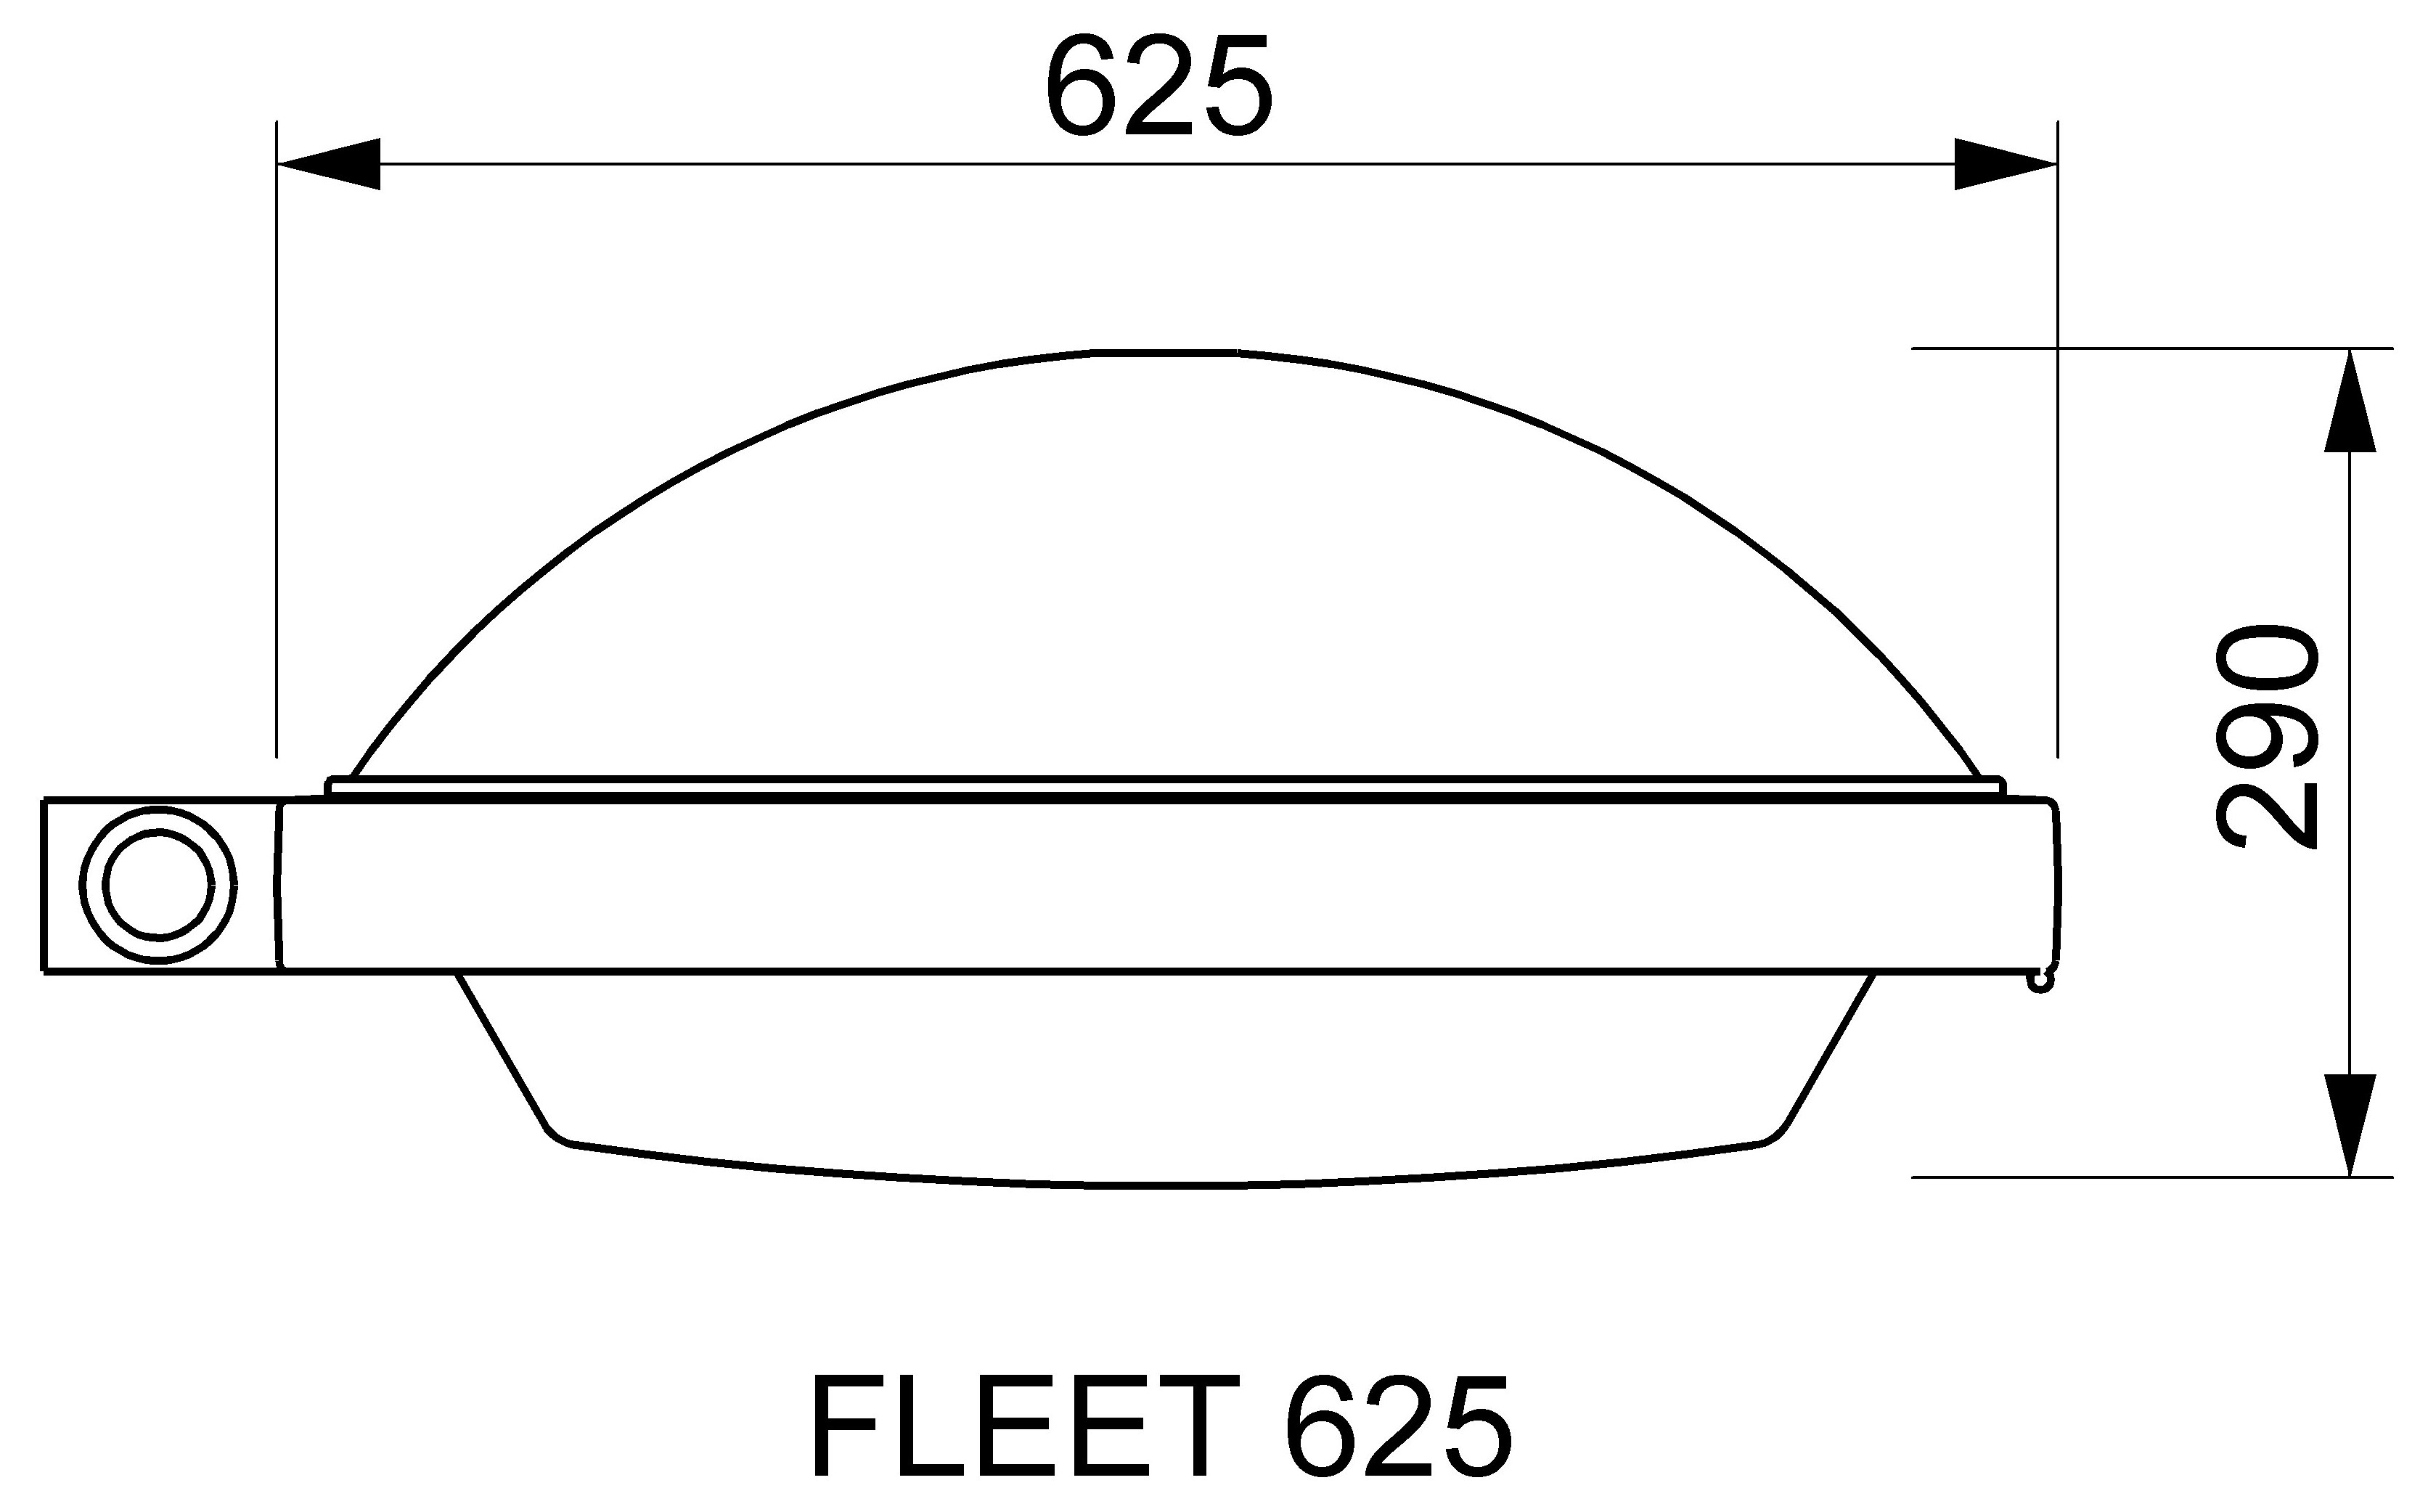 Fleet LED